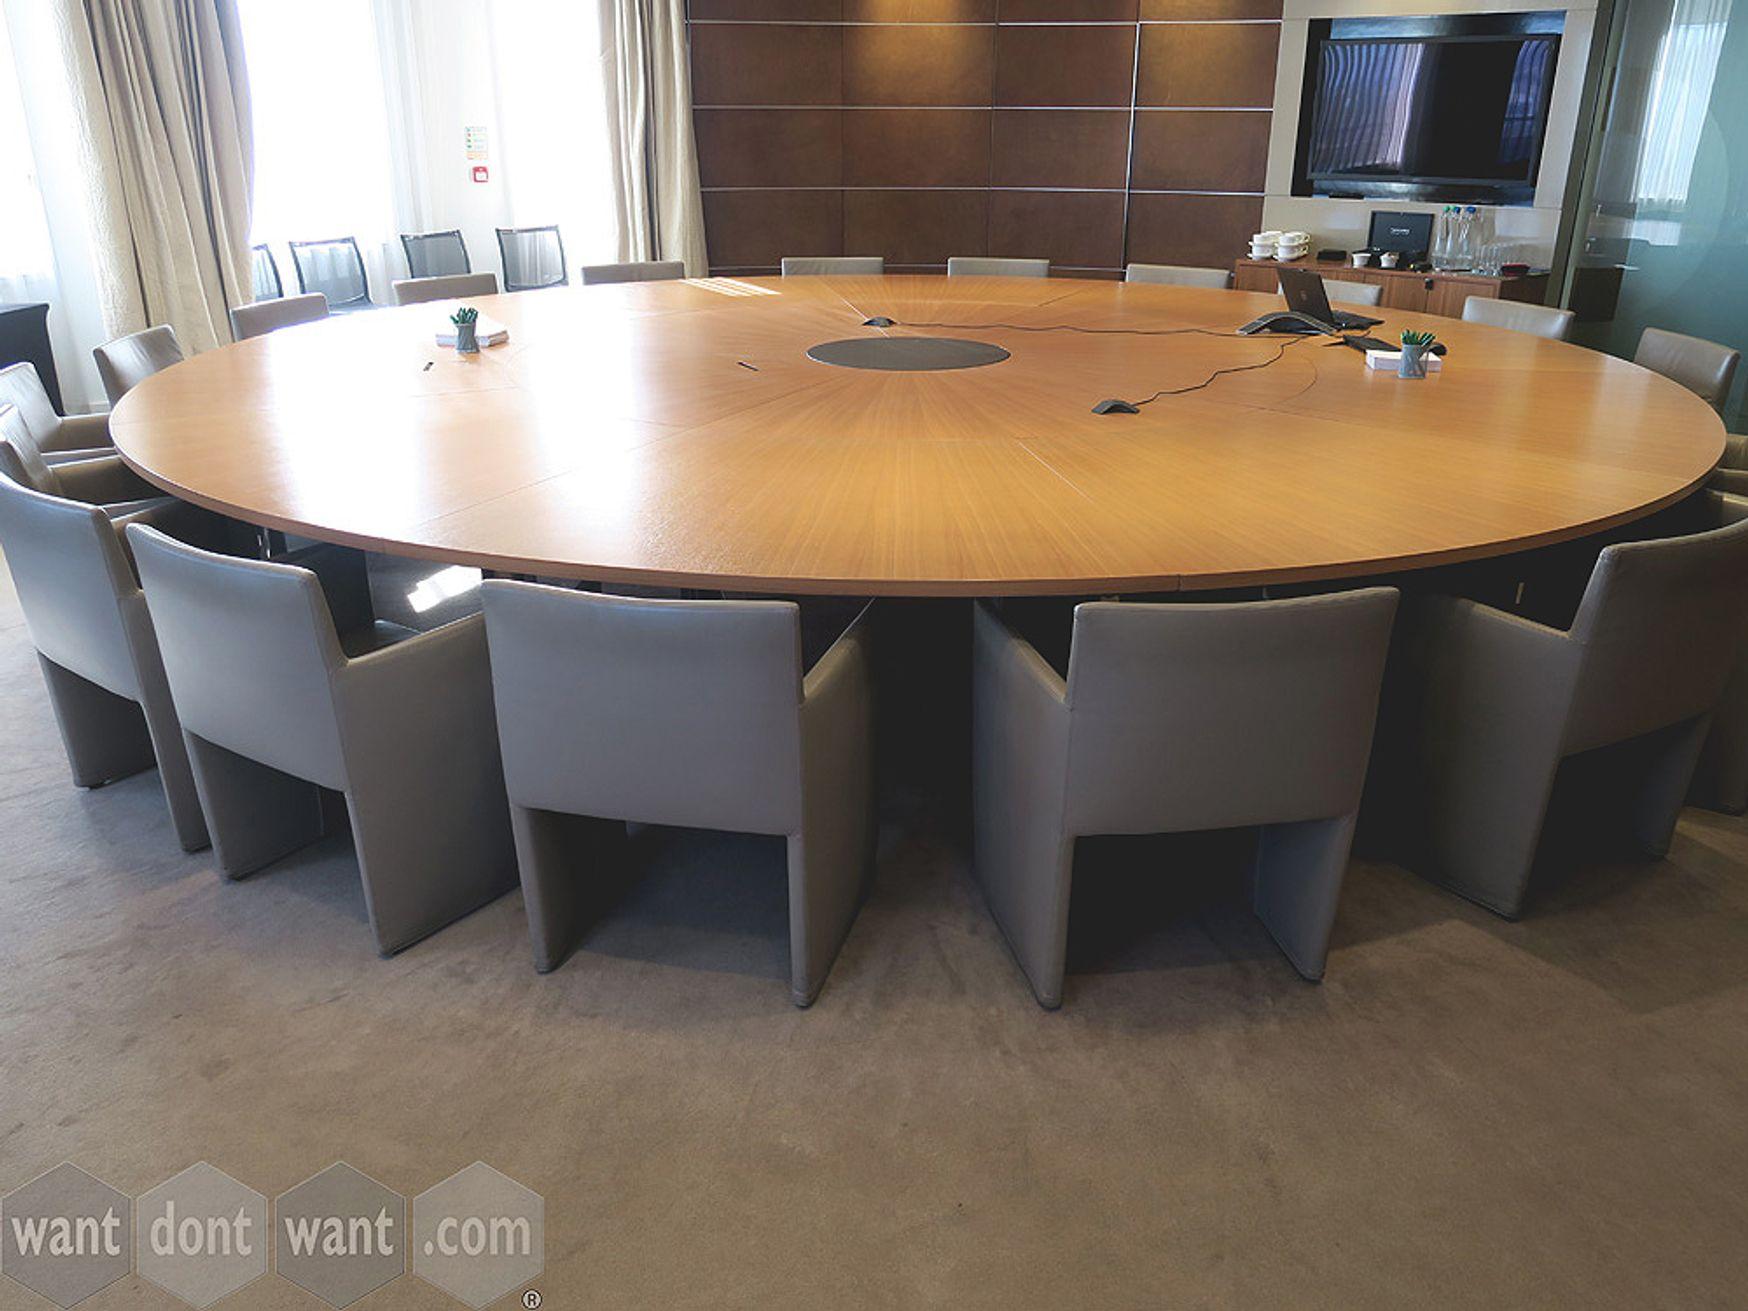 An imposing used 20-seat bespoke circular boardroom table